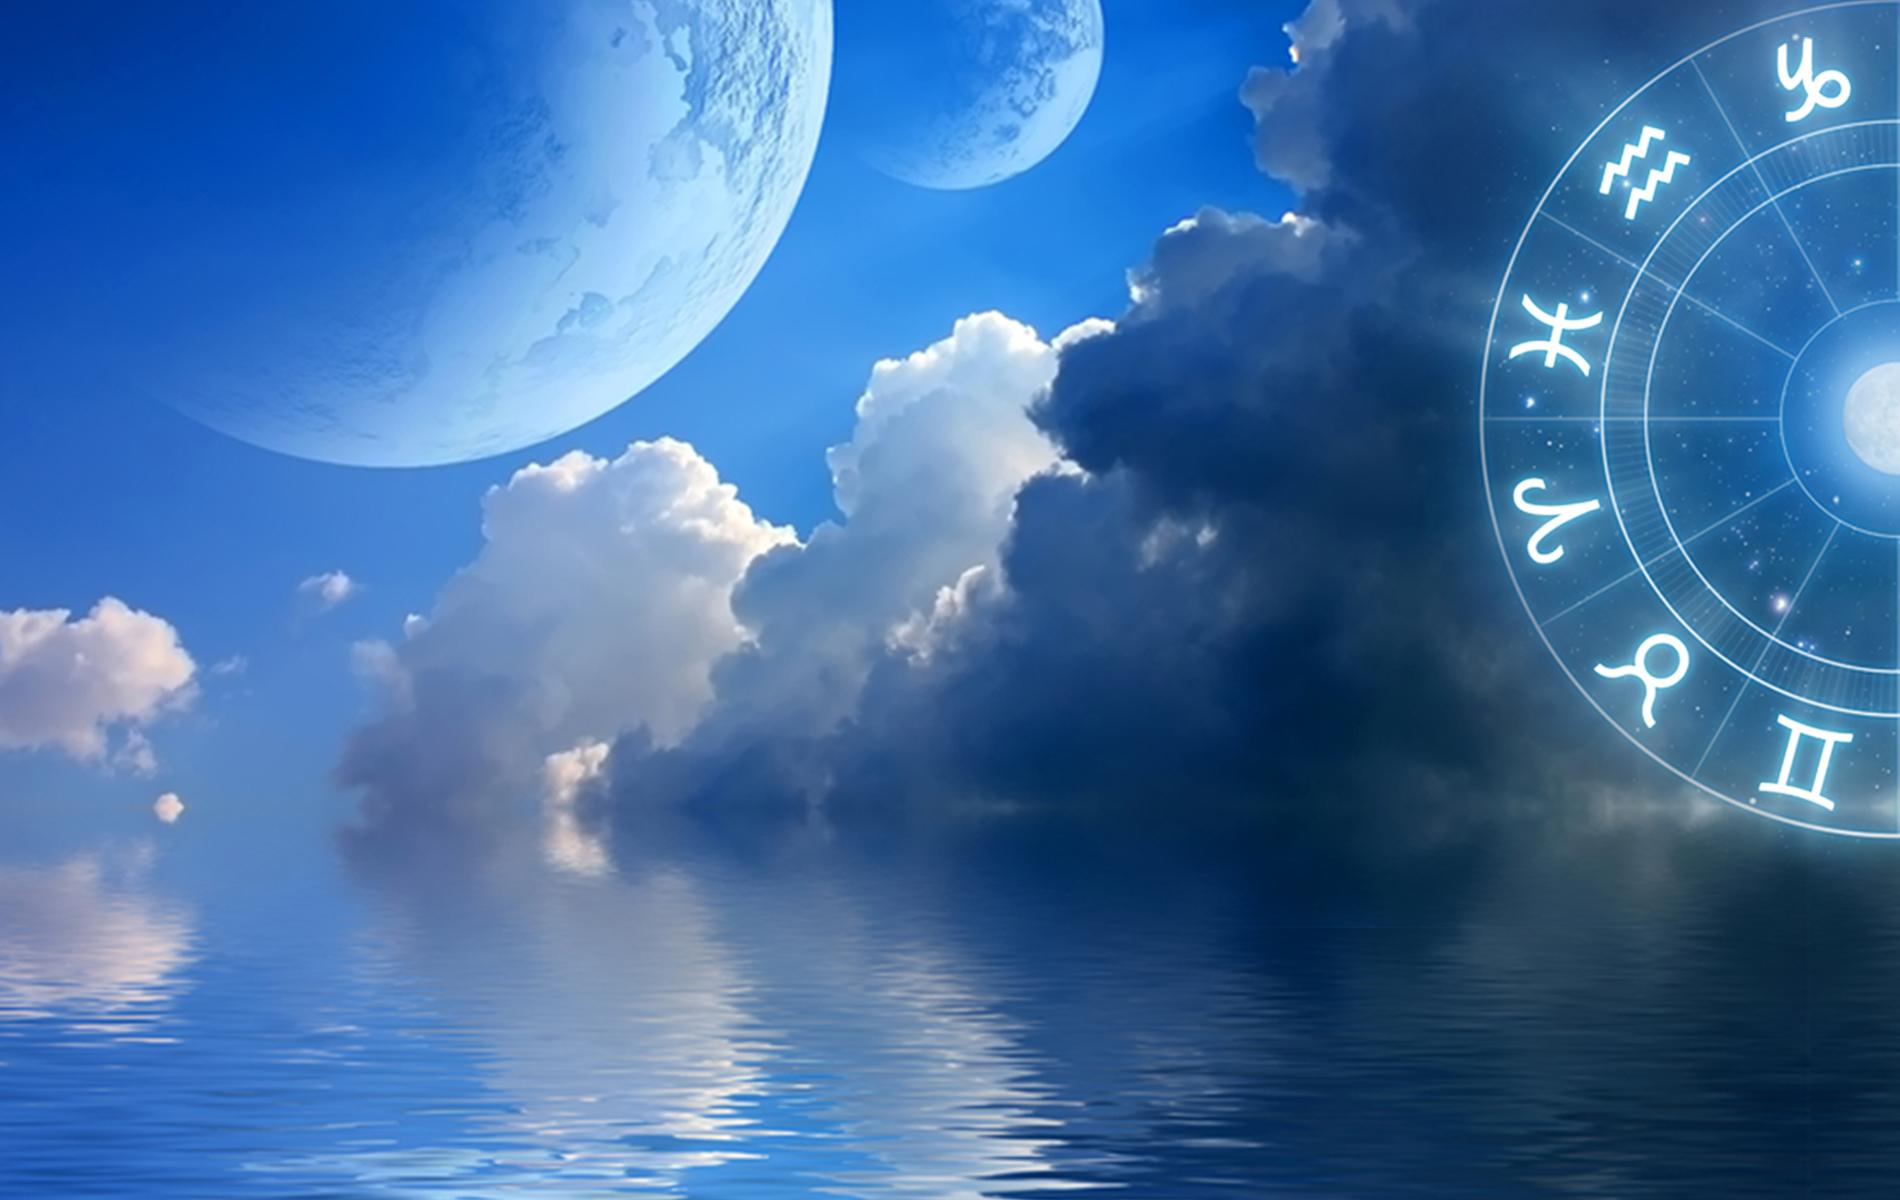 Astrologia hermética - GnosisOnline